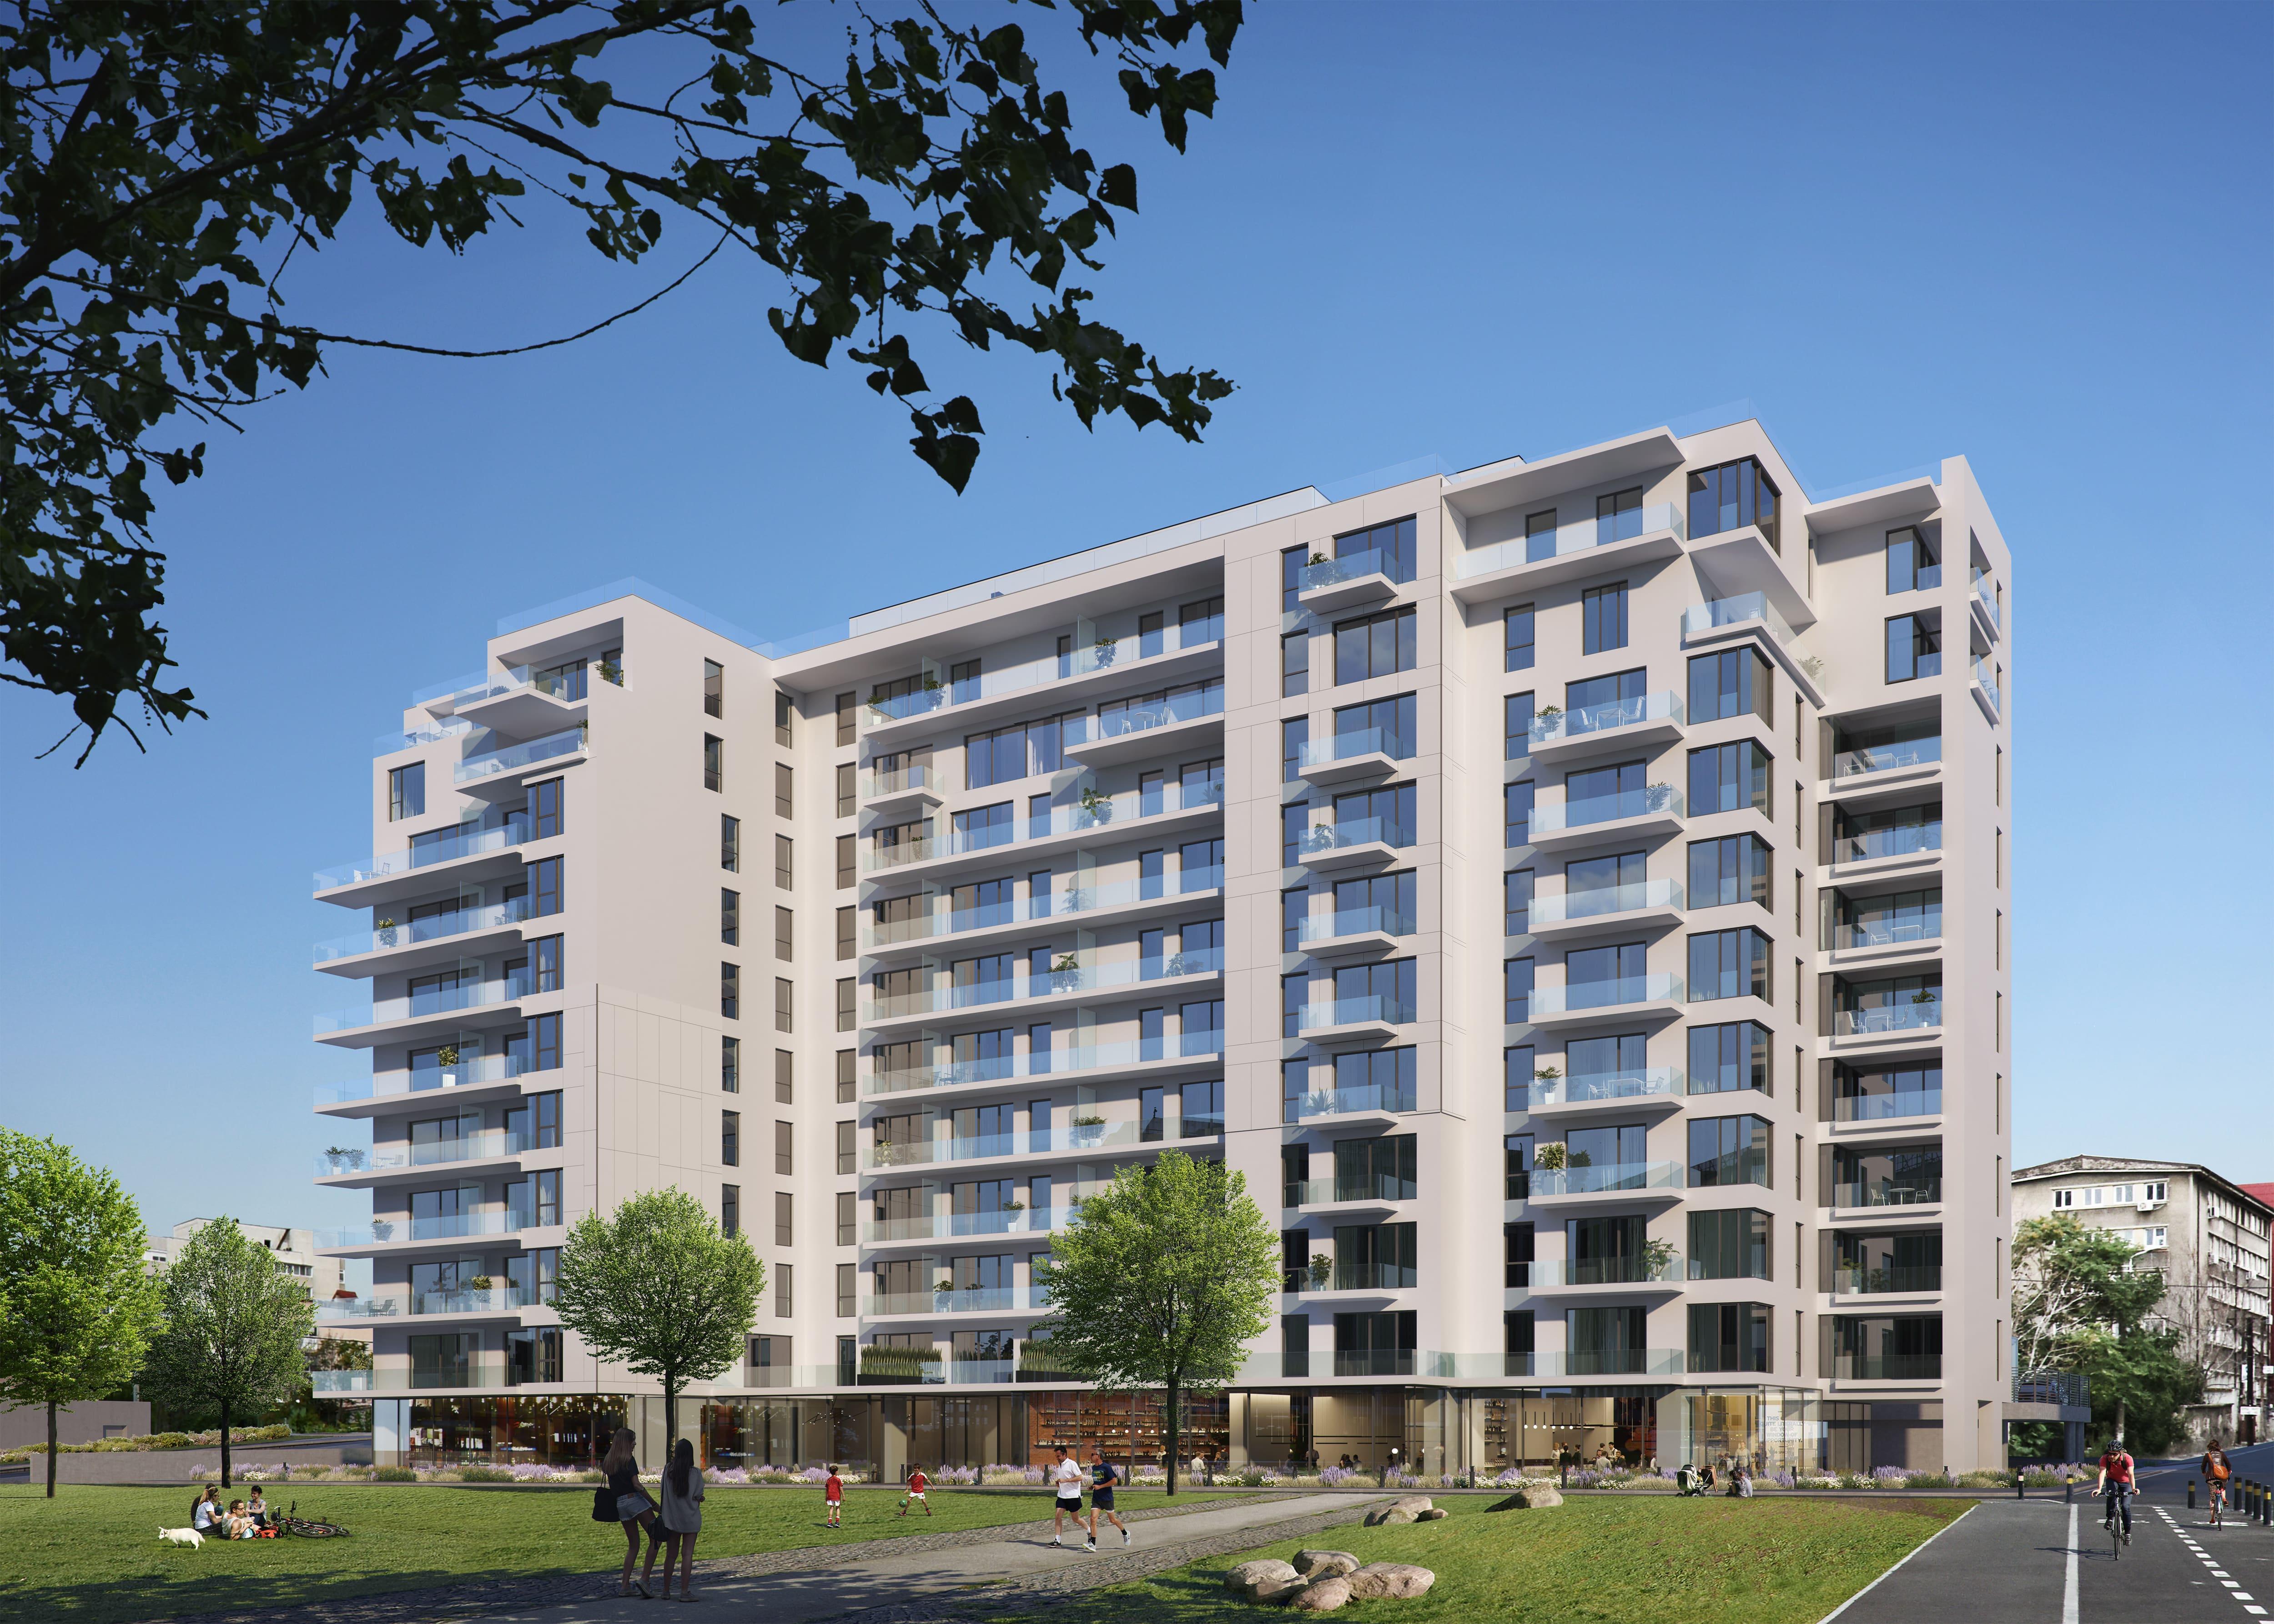 https://ahe-ro.s3.amazonaws.com/10809/penthouse-si-apartamente-unirii-%287%29.jpg